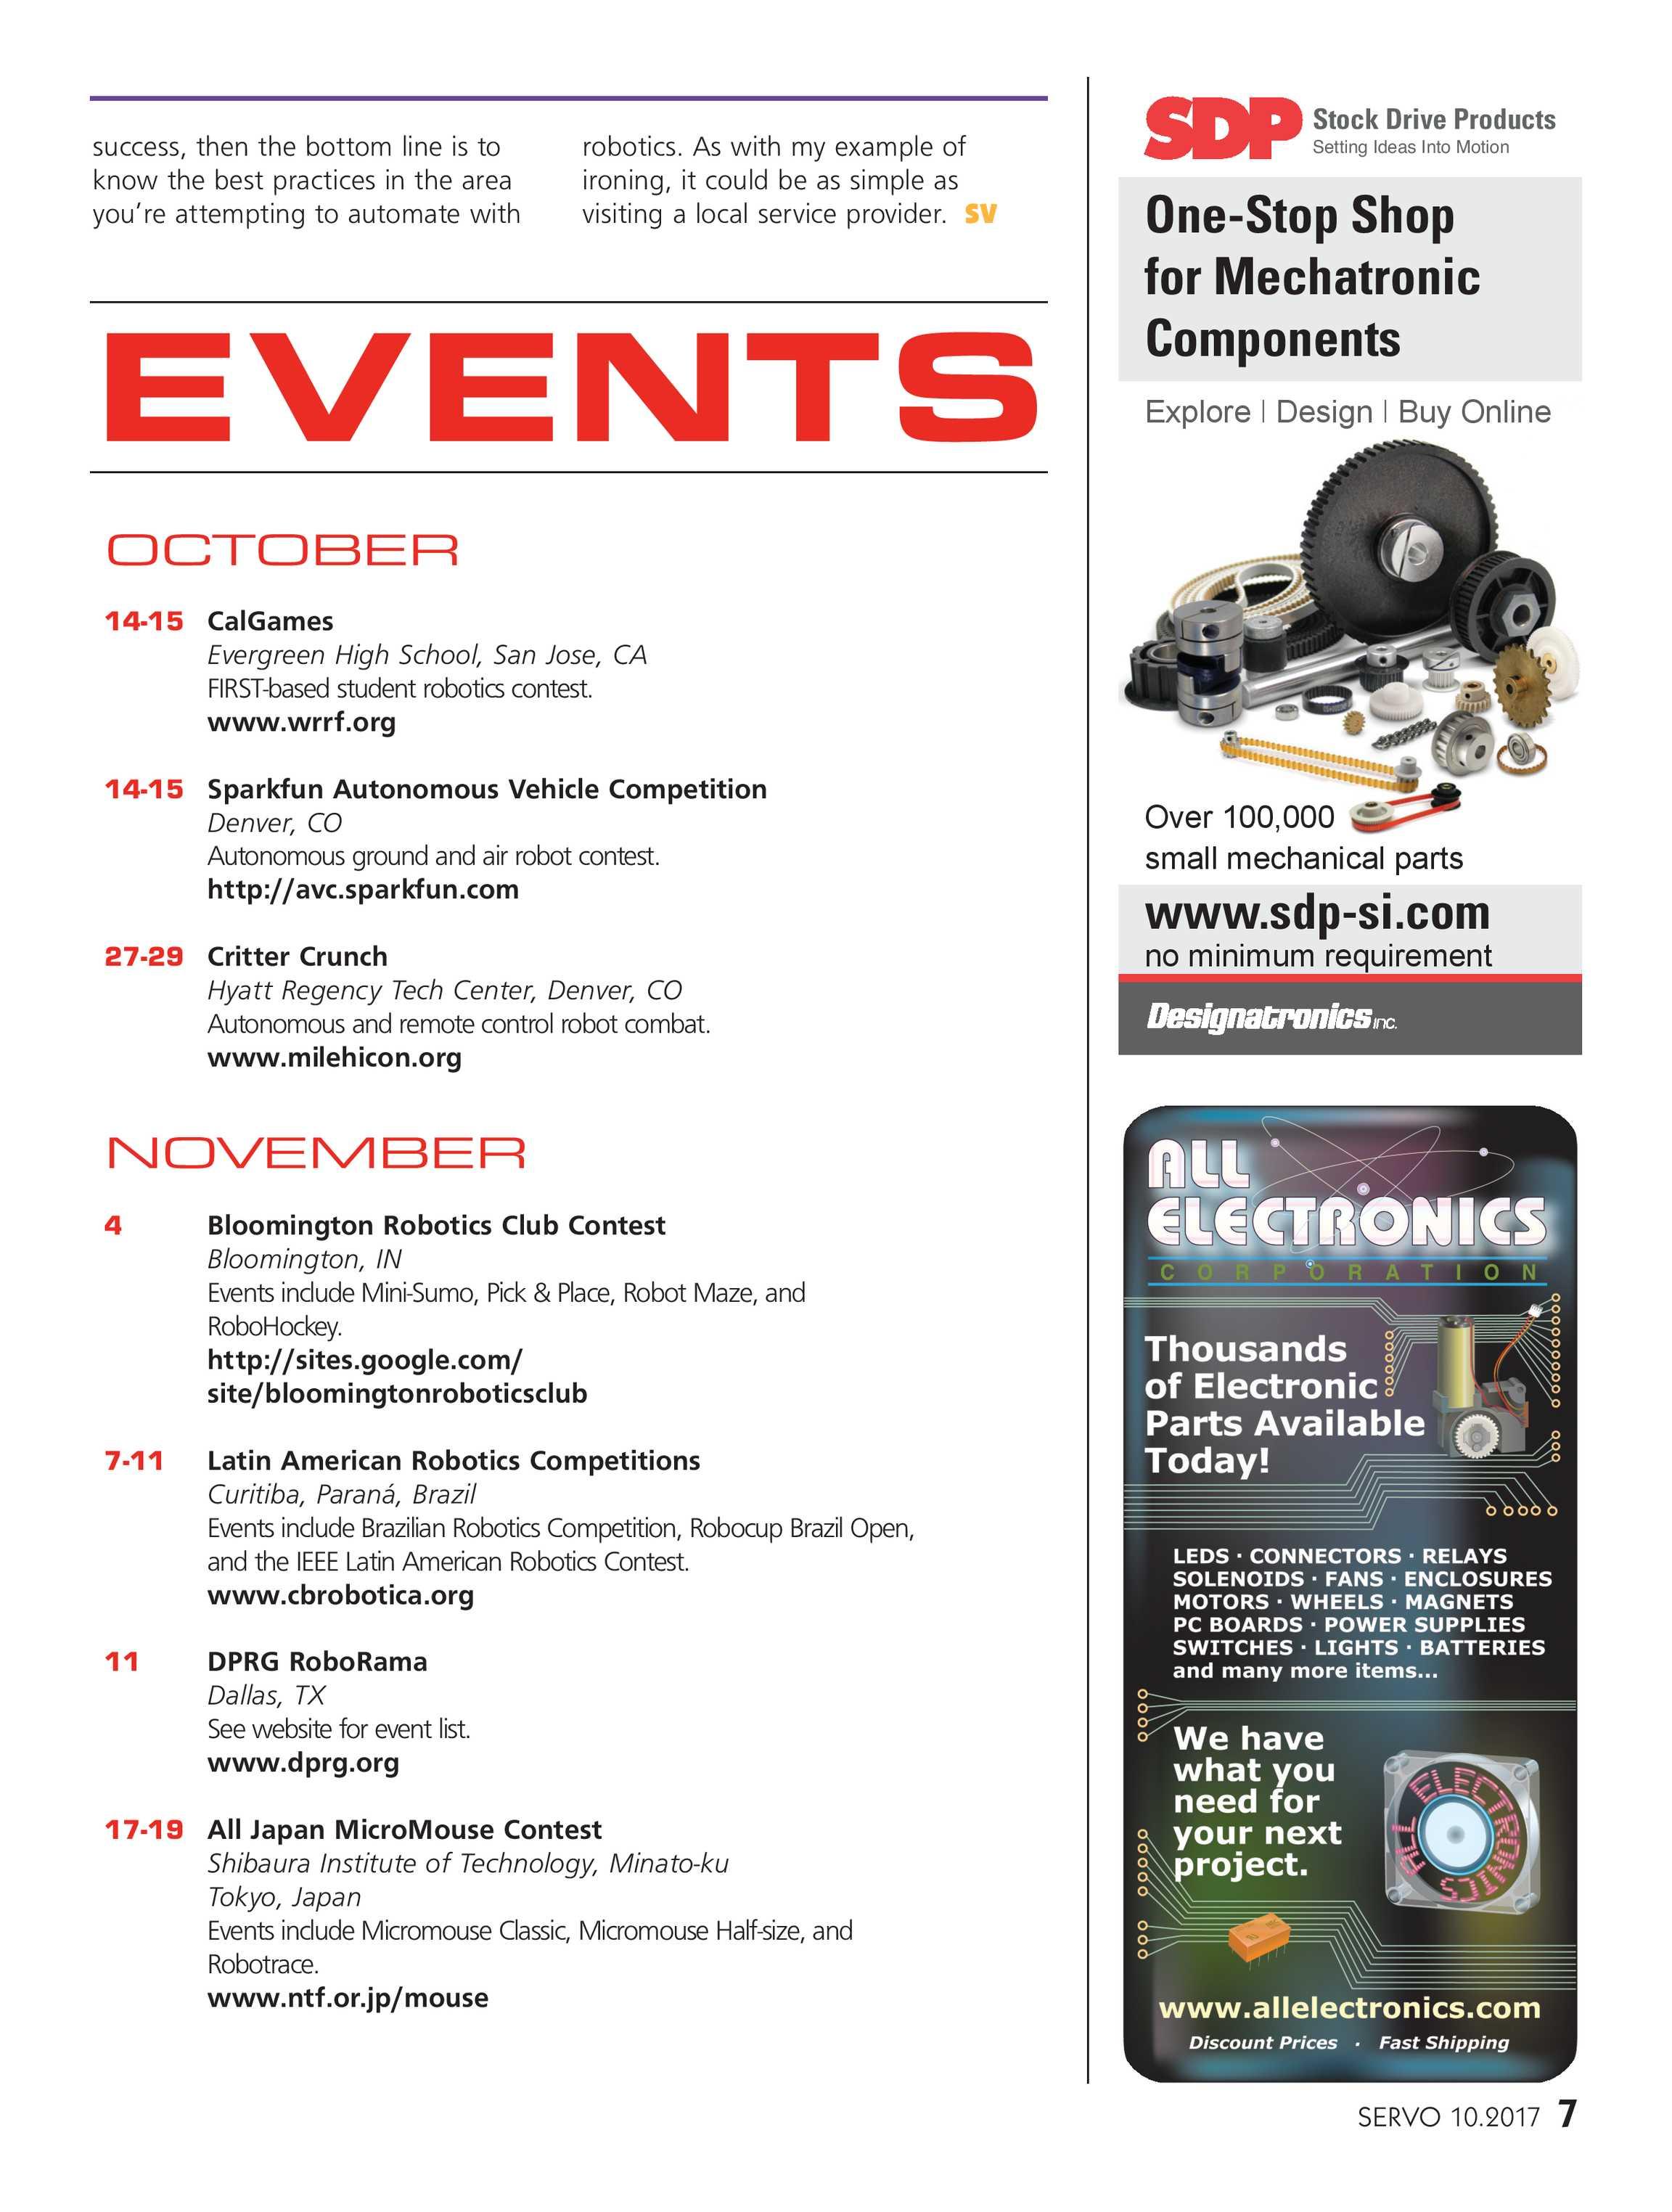 Servo - October 2017 - page 7